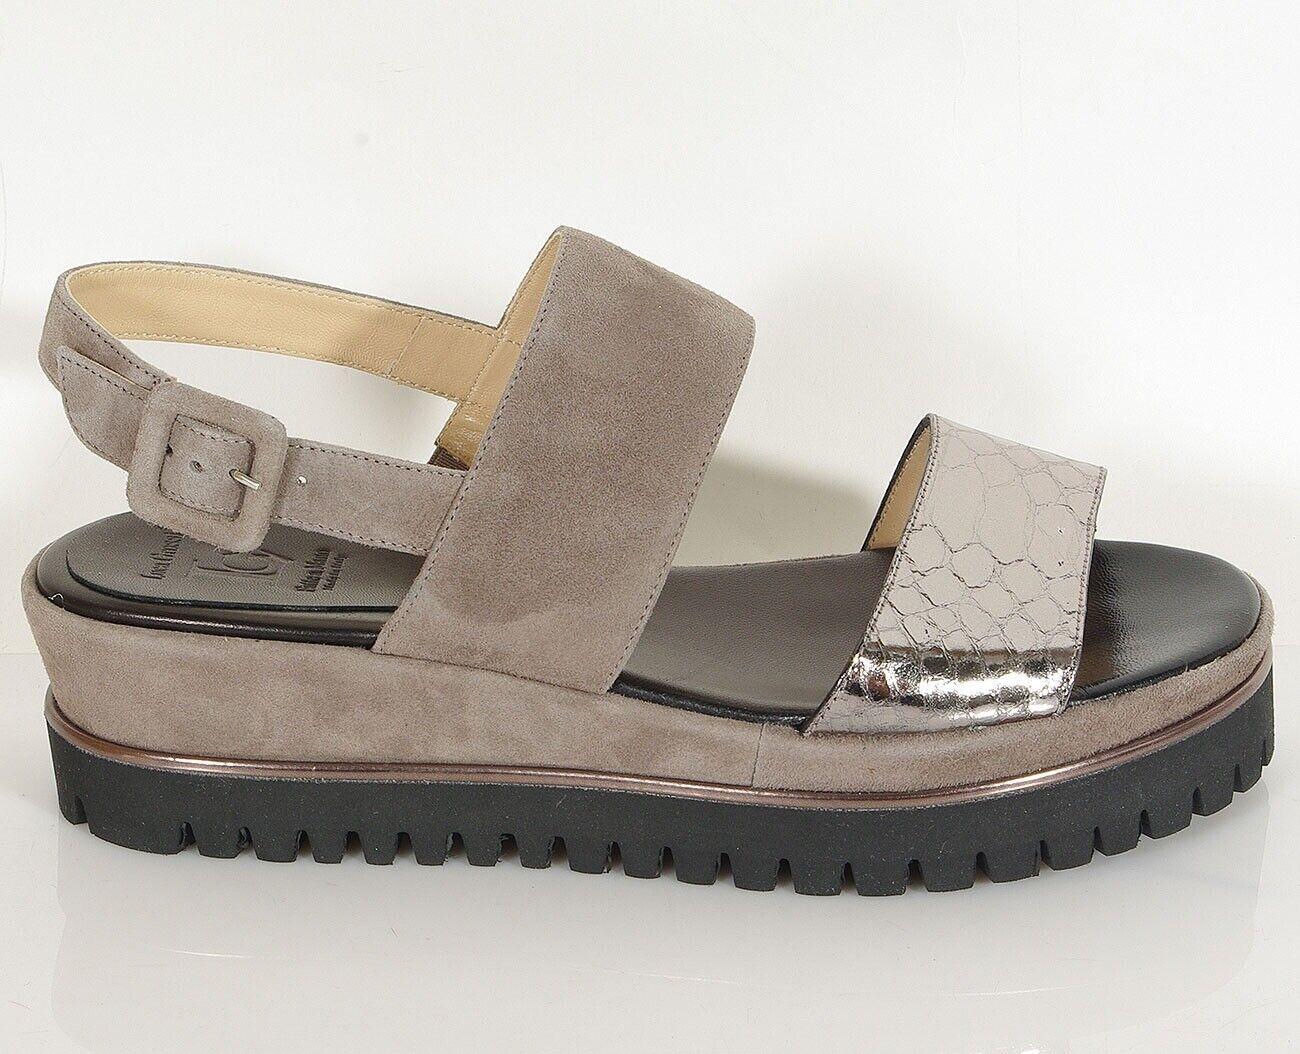 rotuzierung Luca Grossi C855S sandals boa lame acciaio grig